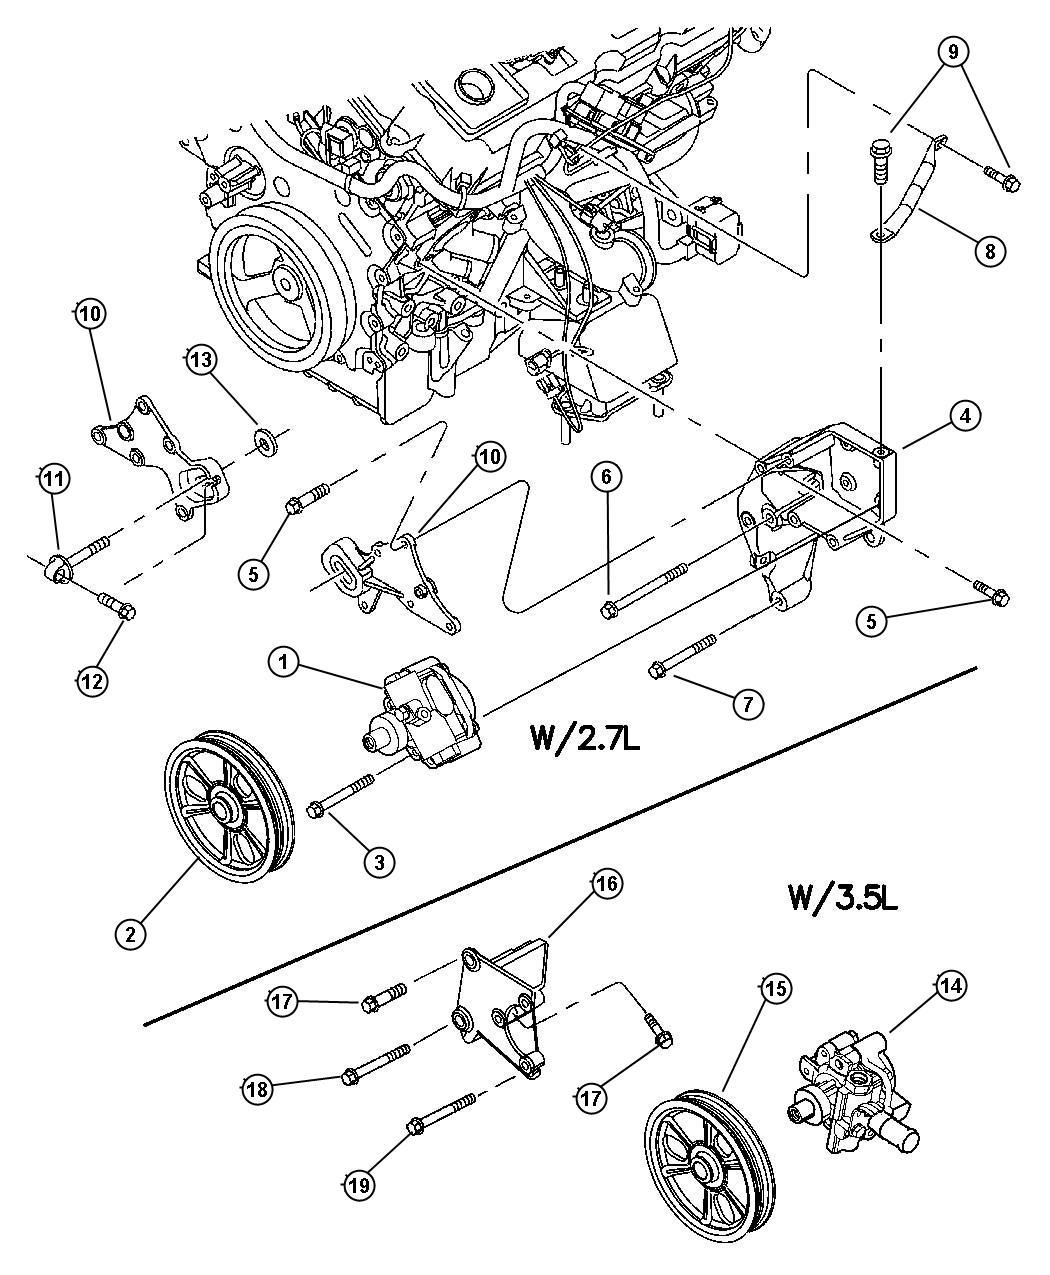 2007 chrysler 300 2.7 engine diagram